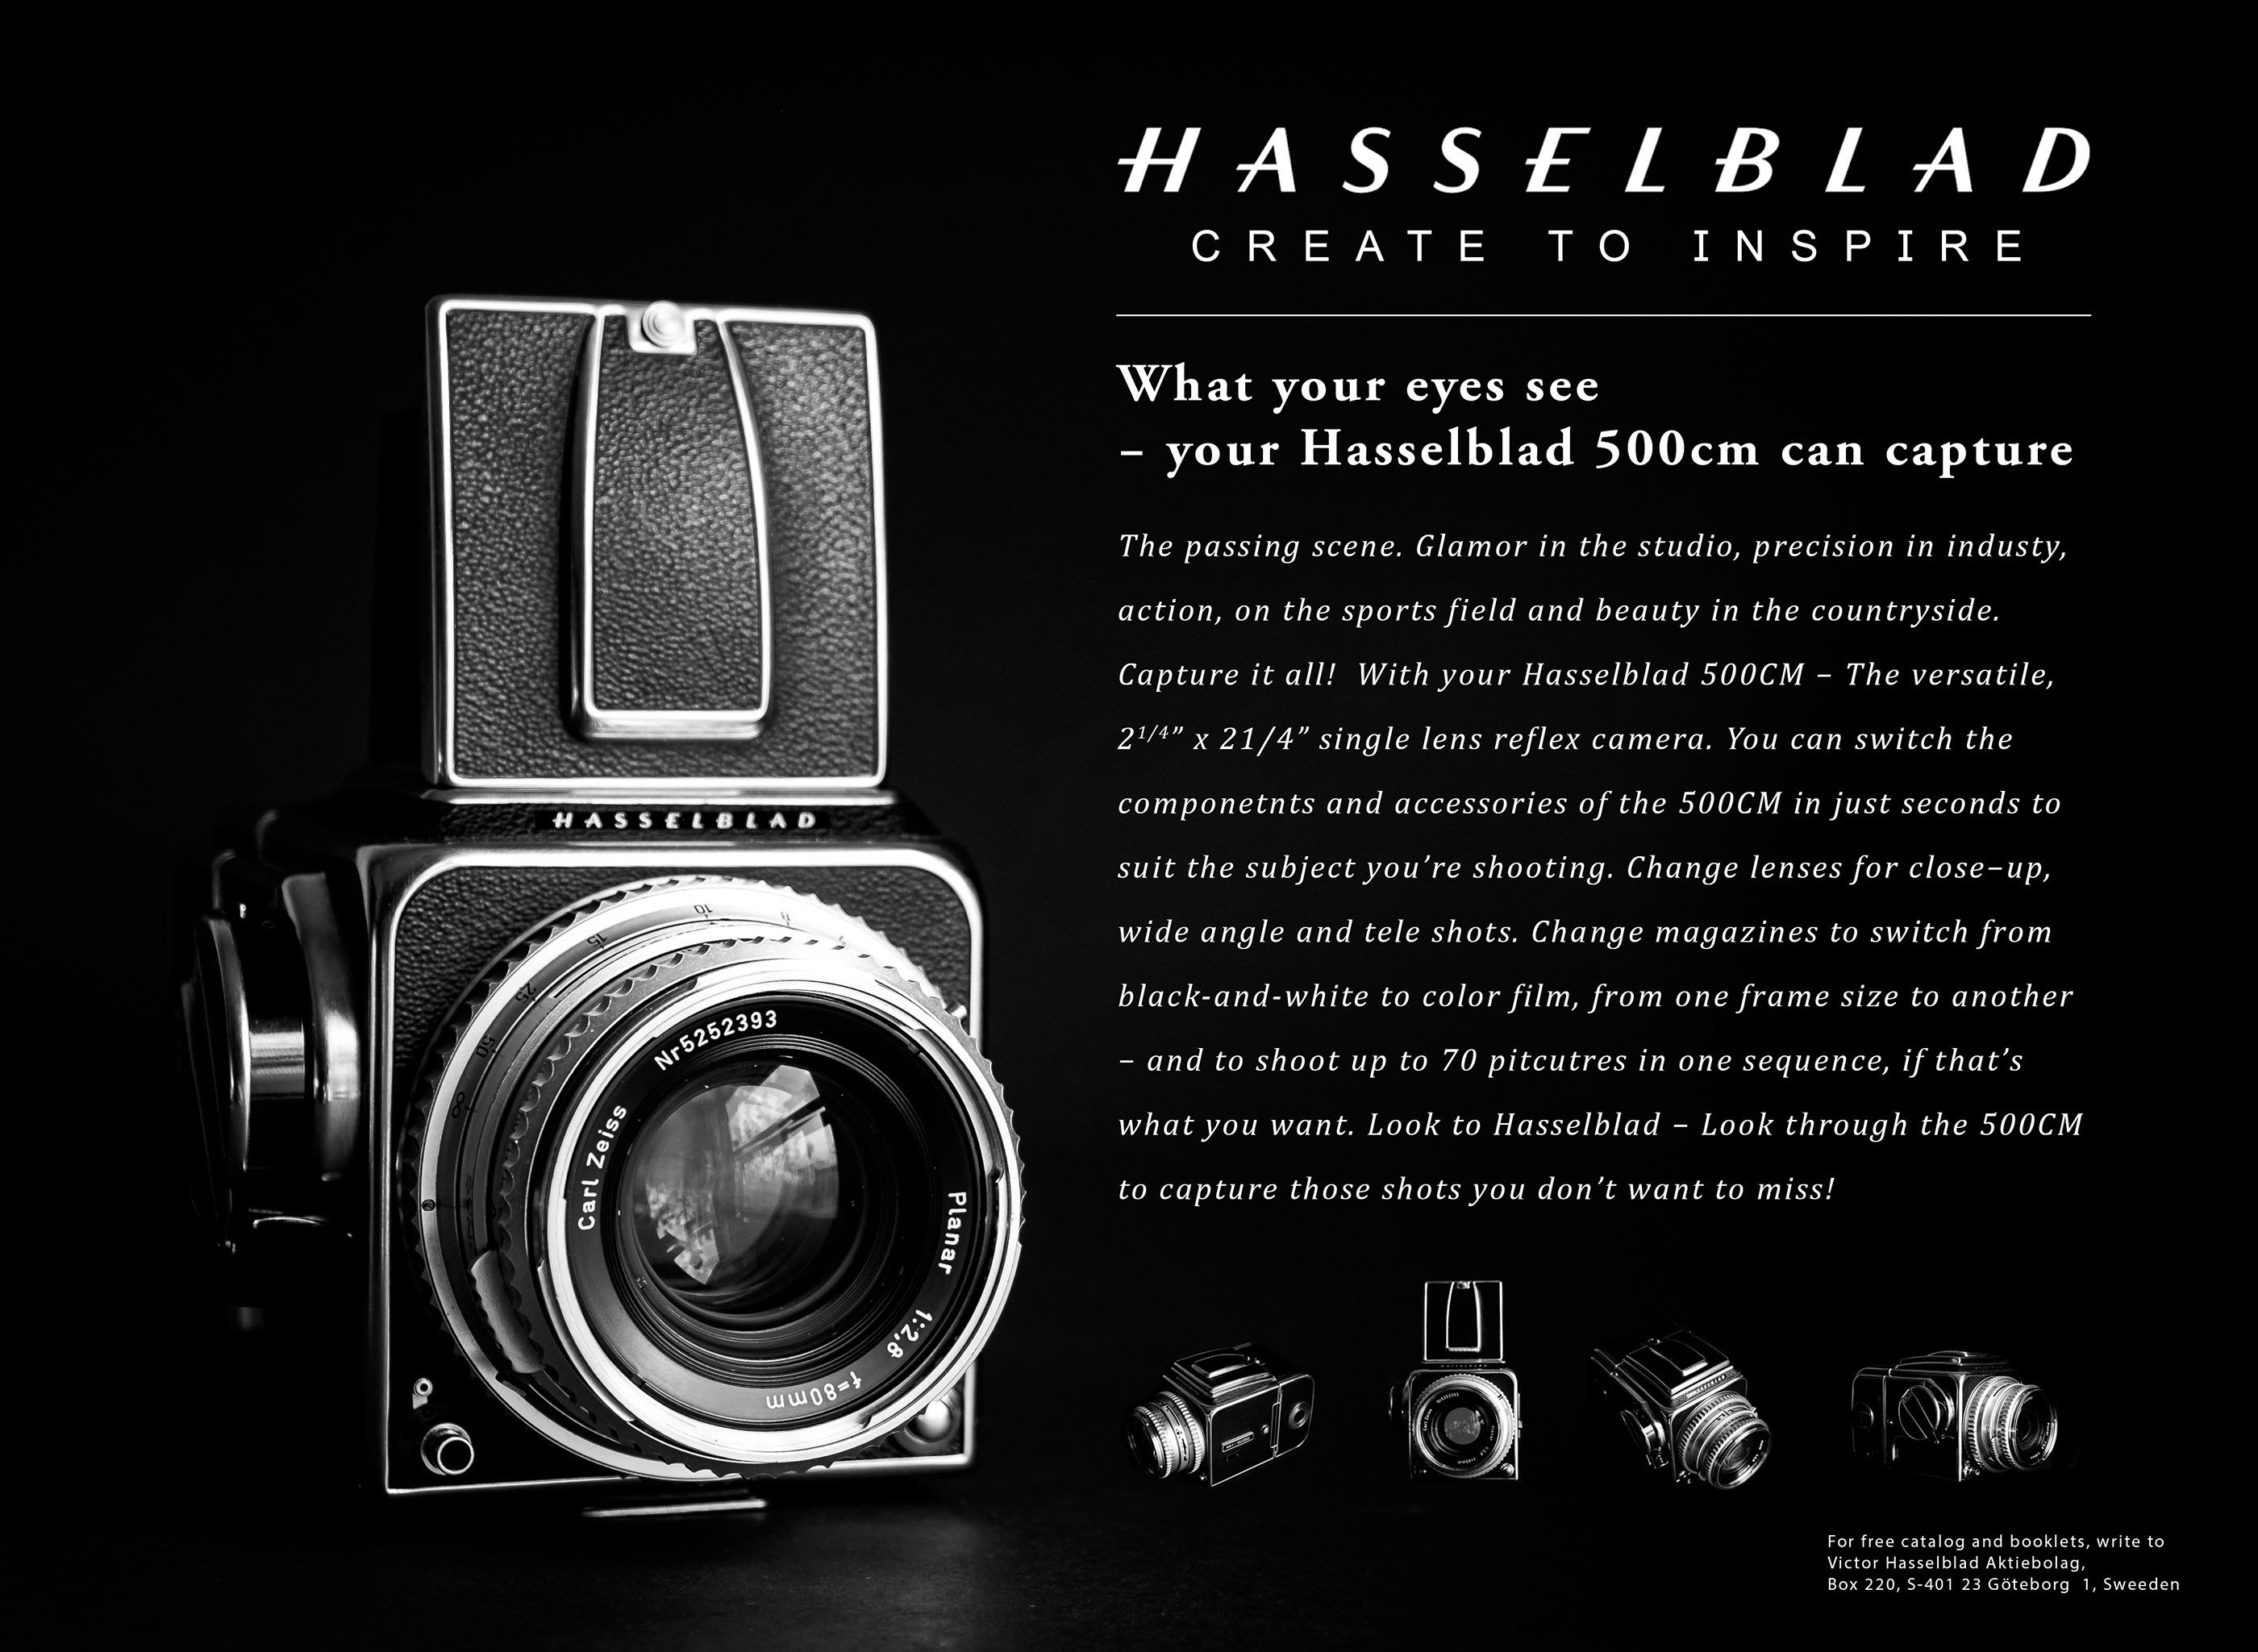 Recreated Hasselblad Advert on Behance